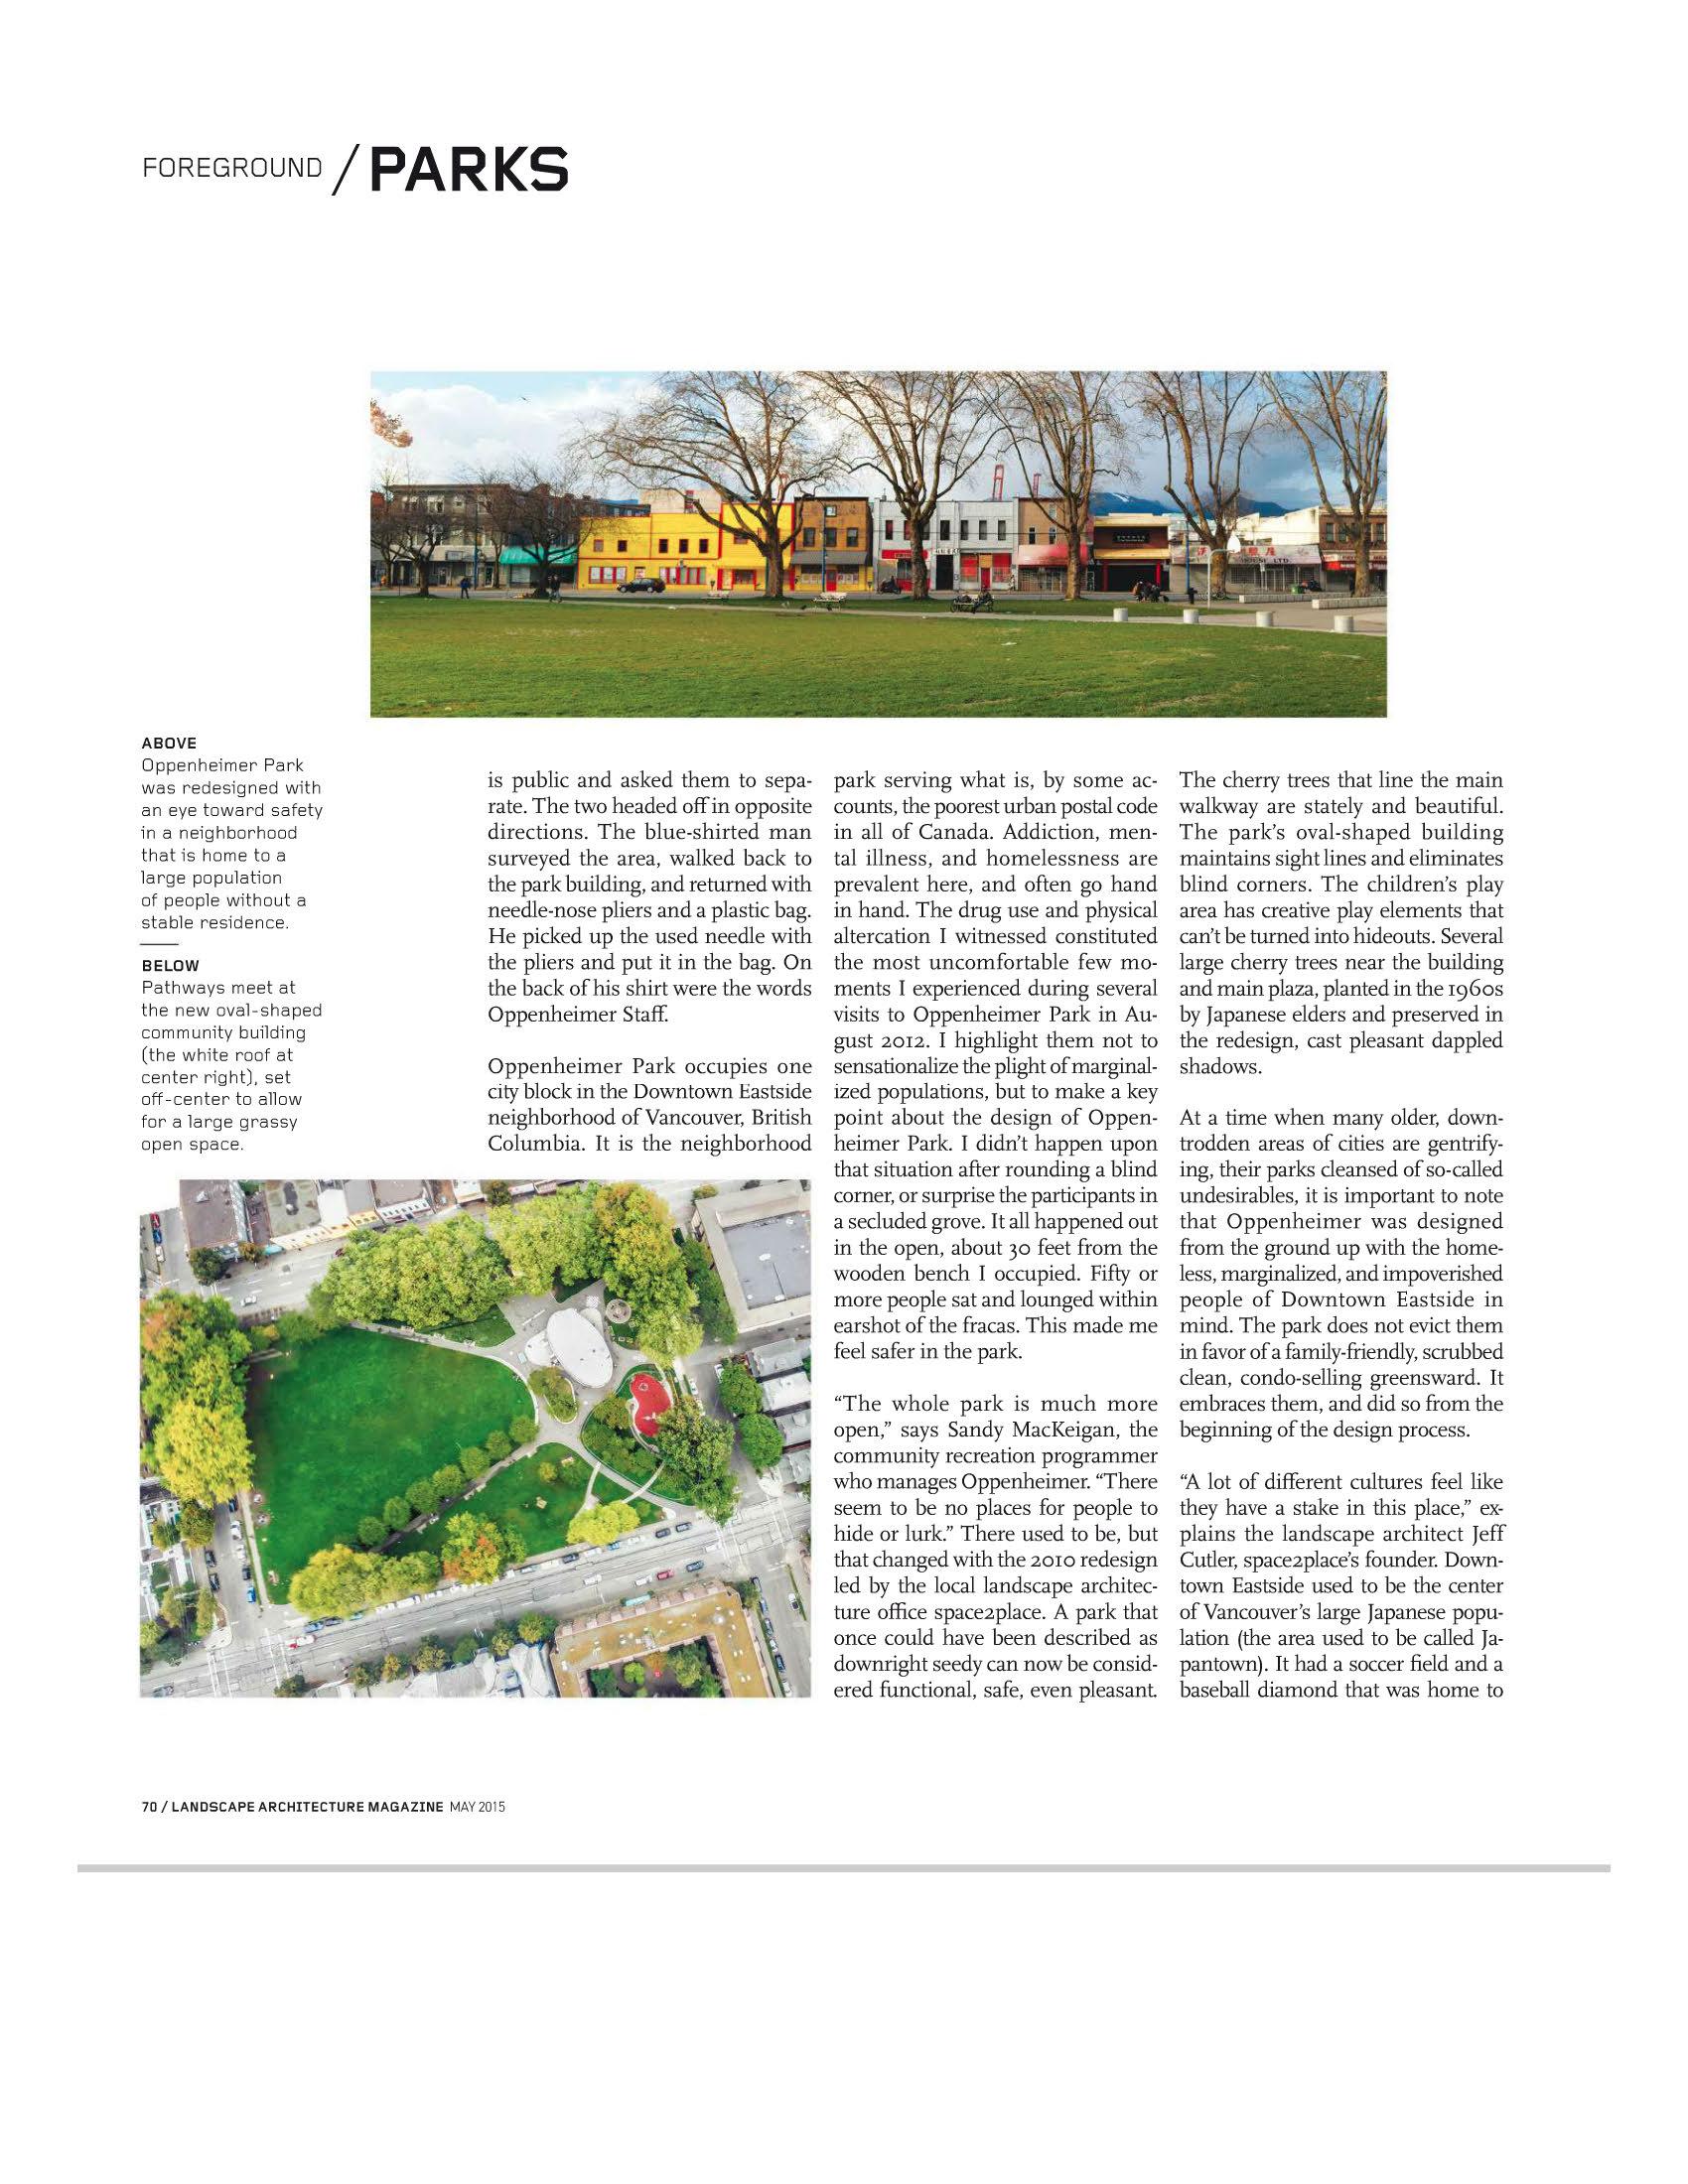 Landscape Architecture Magazine   Oppenheimer park   May 2015_Page_2.jpg